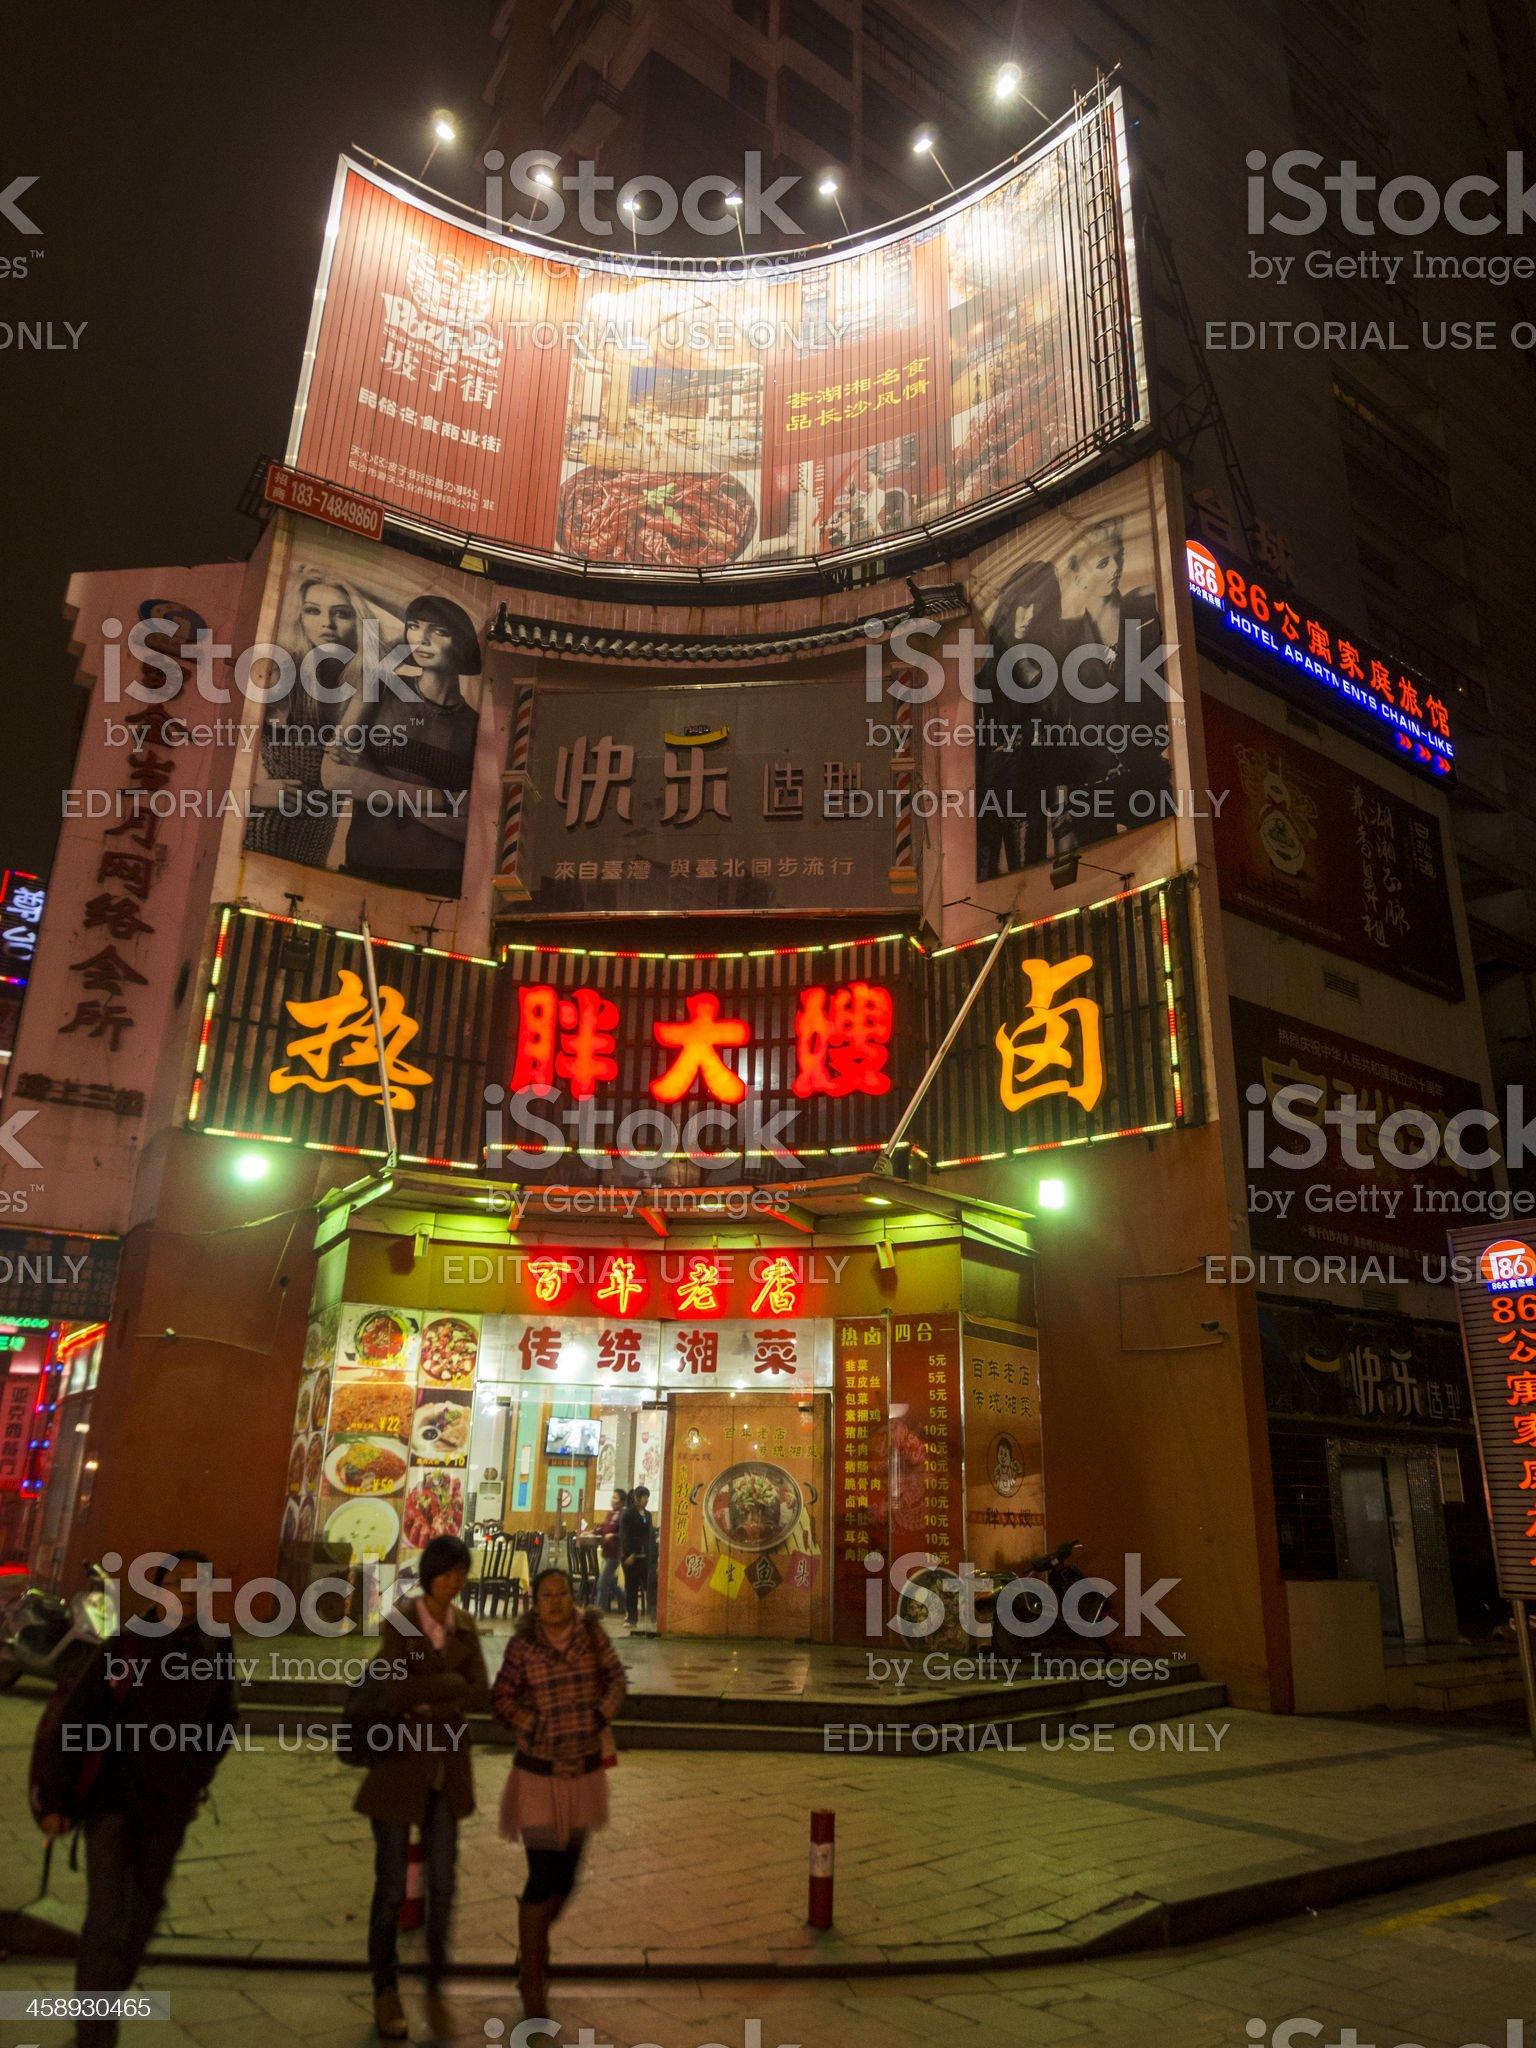 Hotpot restaurant, Changsha China royalty-free stock photo